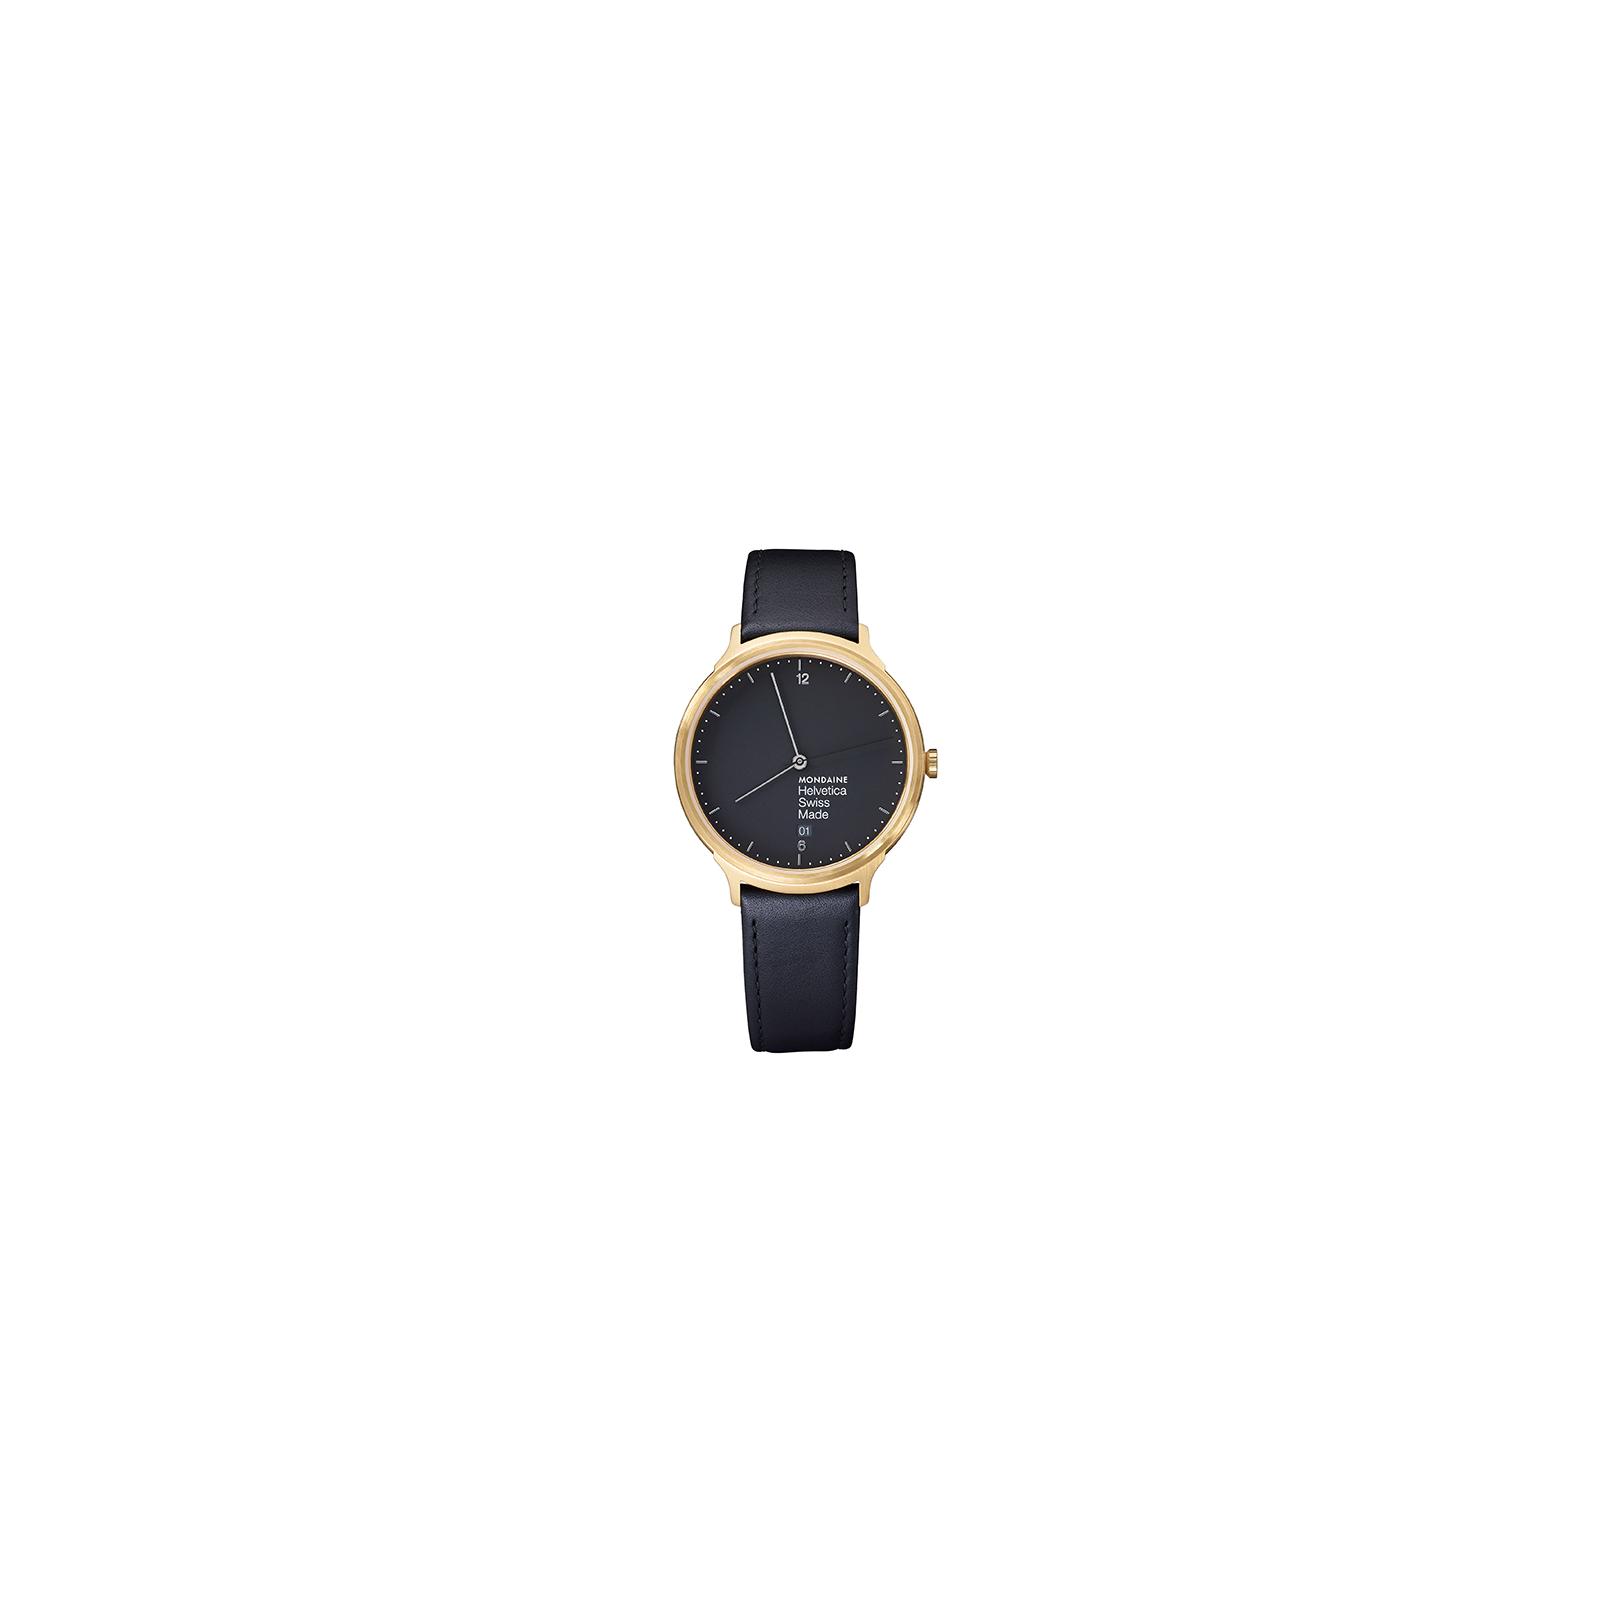 Reloj Mondaine Helvetica Light 38 MH1 L2221 LB